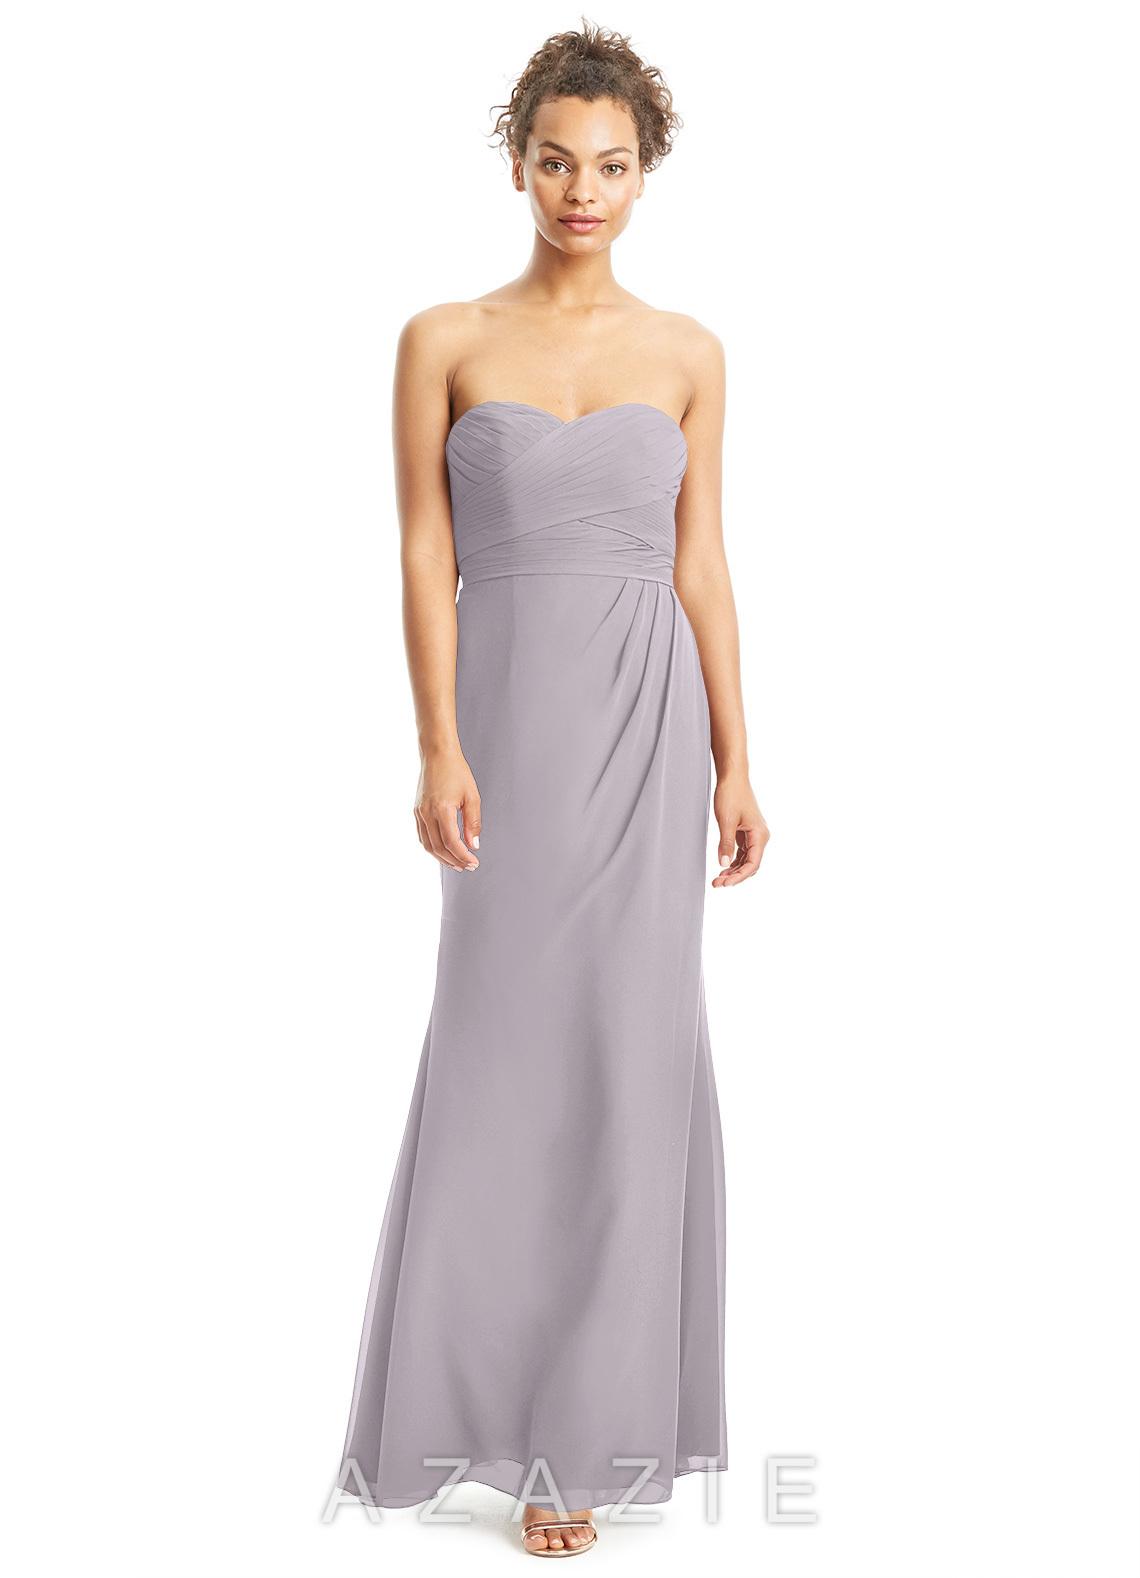 Azazie Ivy Bridesmaid Dress | Azazie